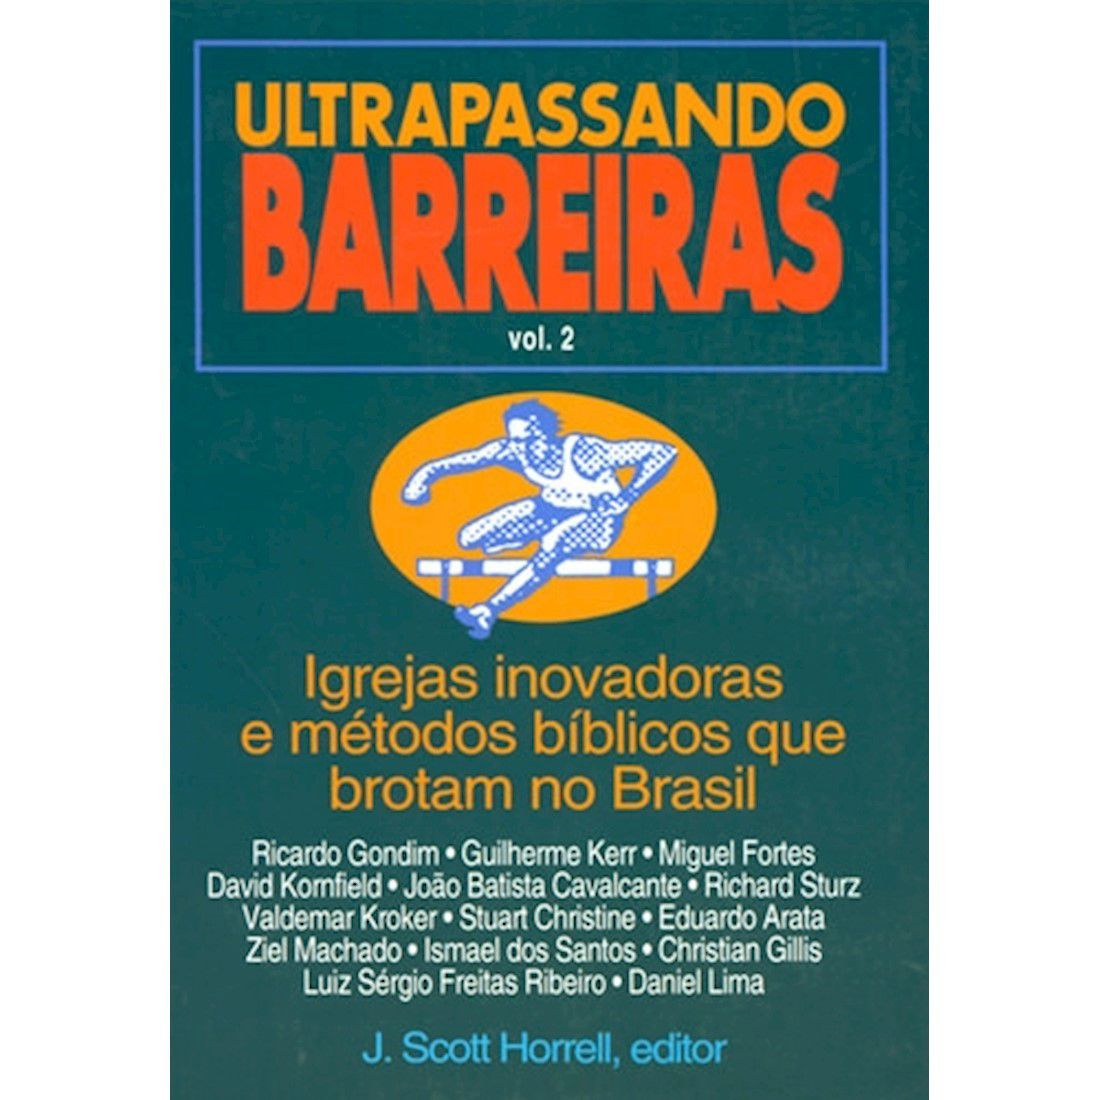 Livro Ultrapassando Barreiras Vol. 2 - Produto Reembalado